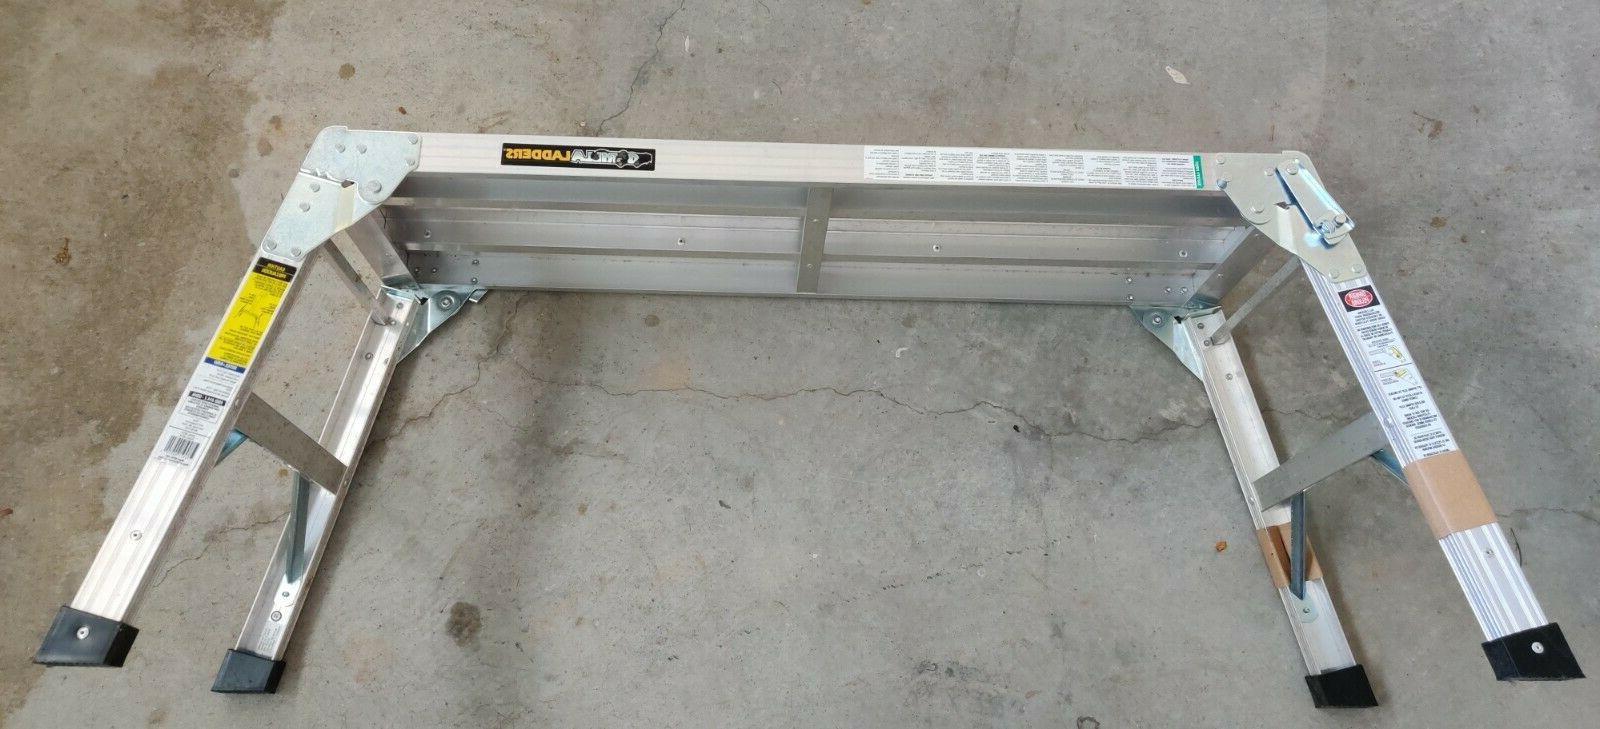 aluminum slim fold work platform max 250